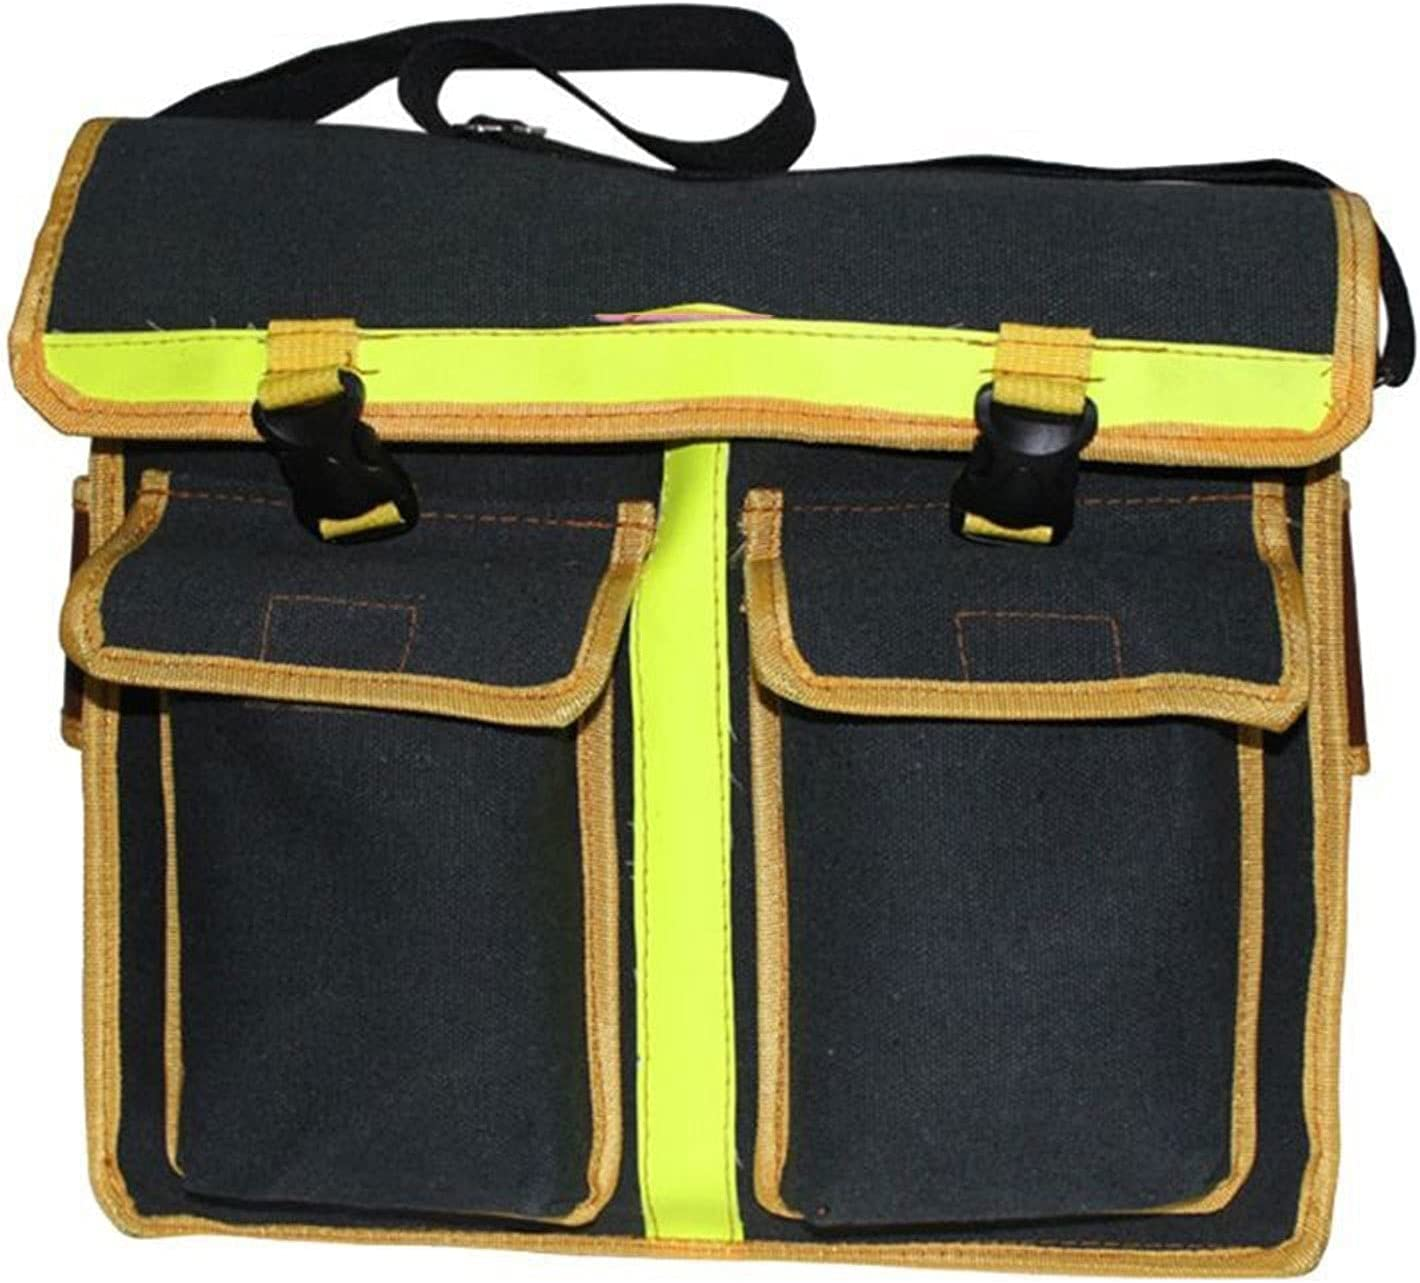 JKXWX Tool Bag Hardware Toolkit Shoulder Bag Oxford Cloth Tool S